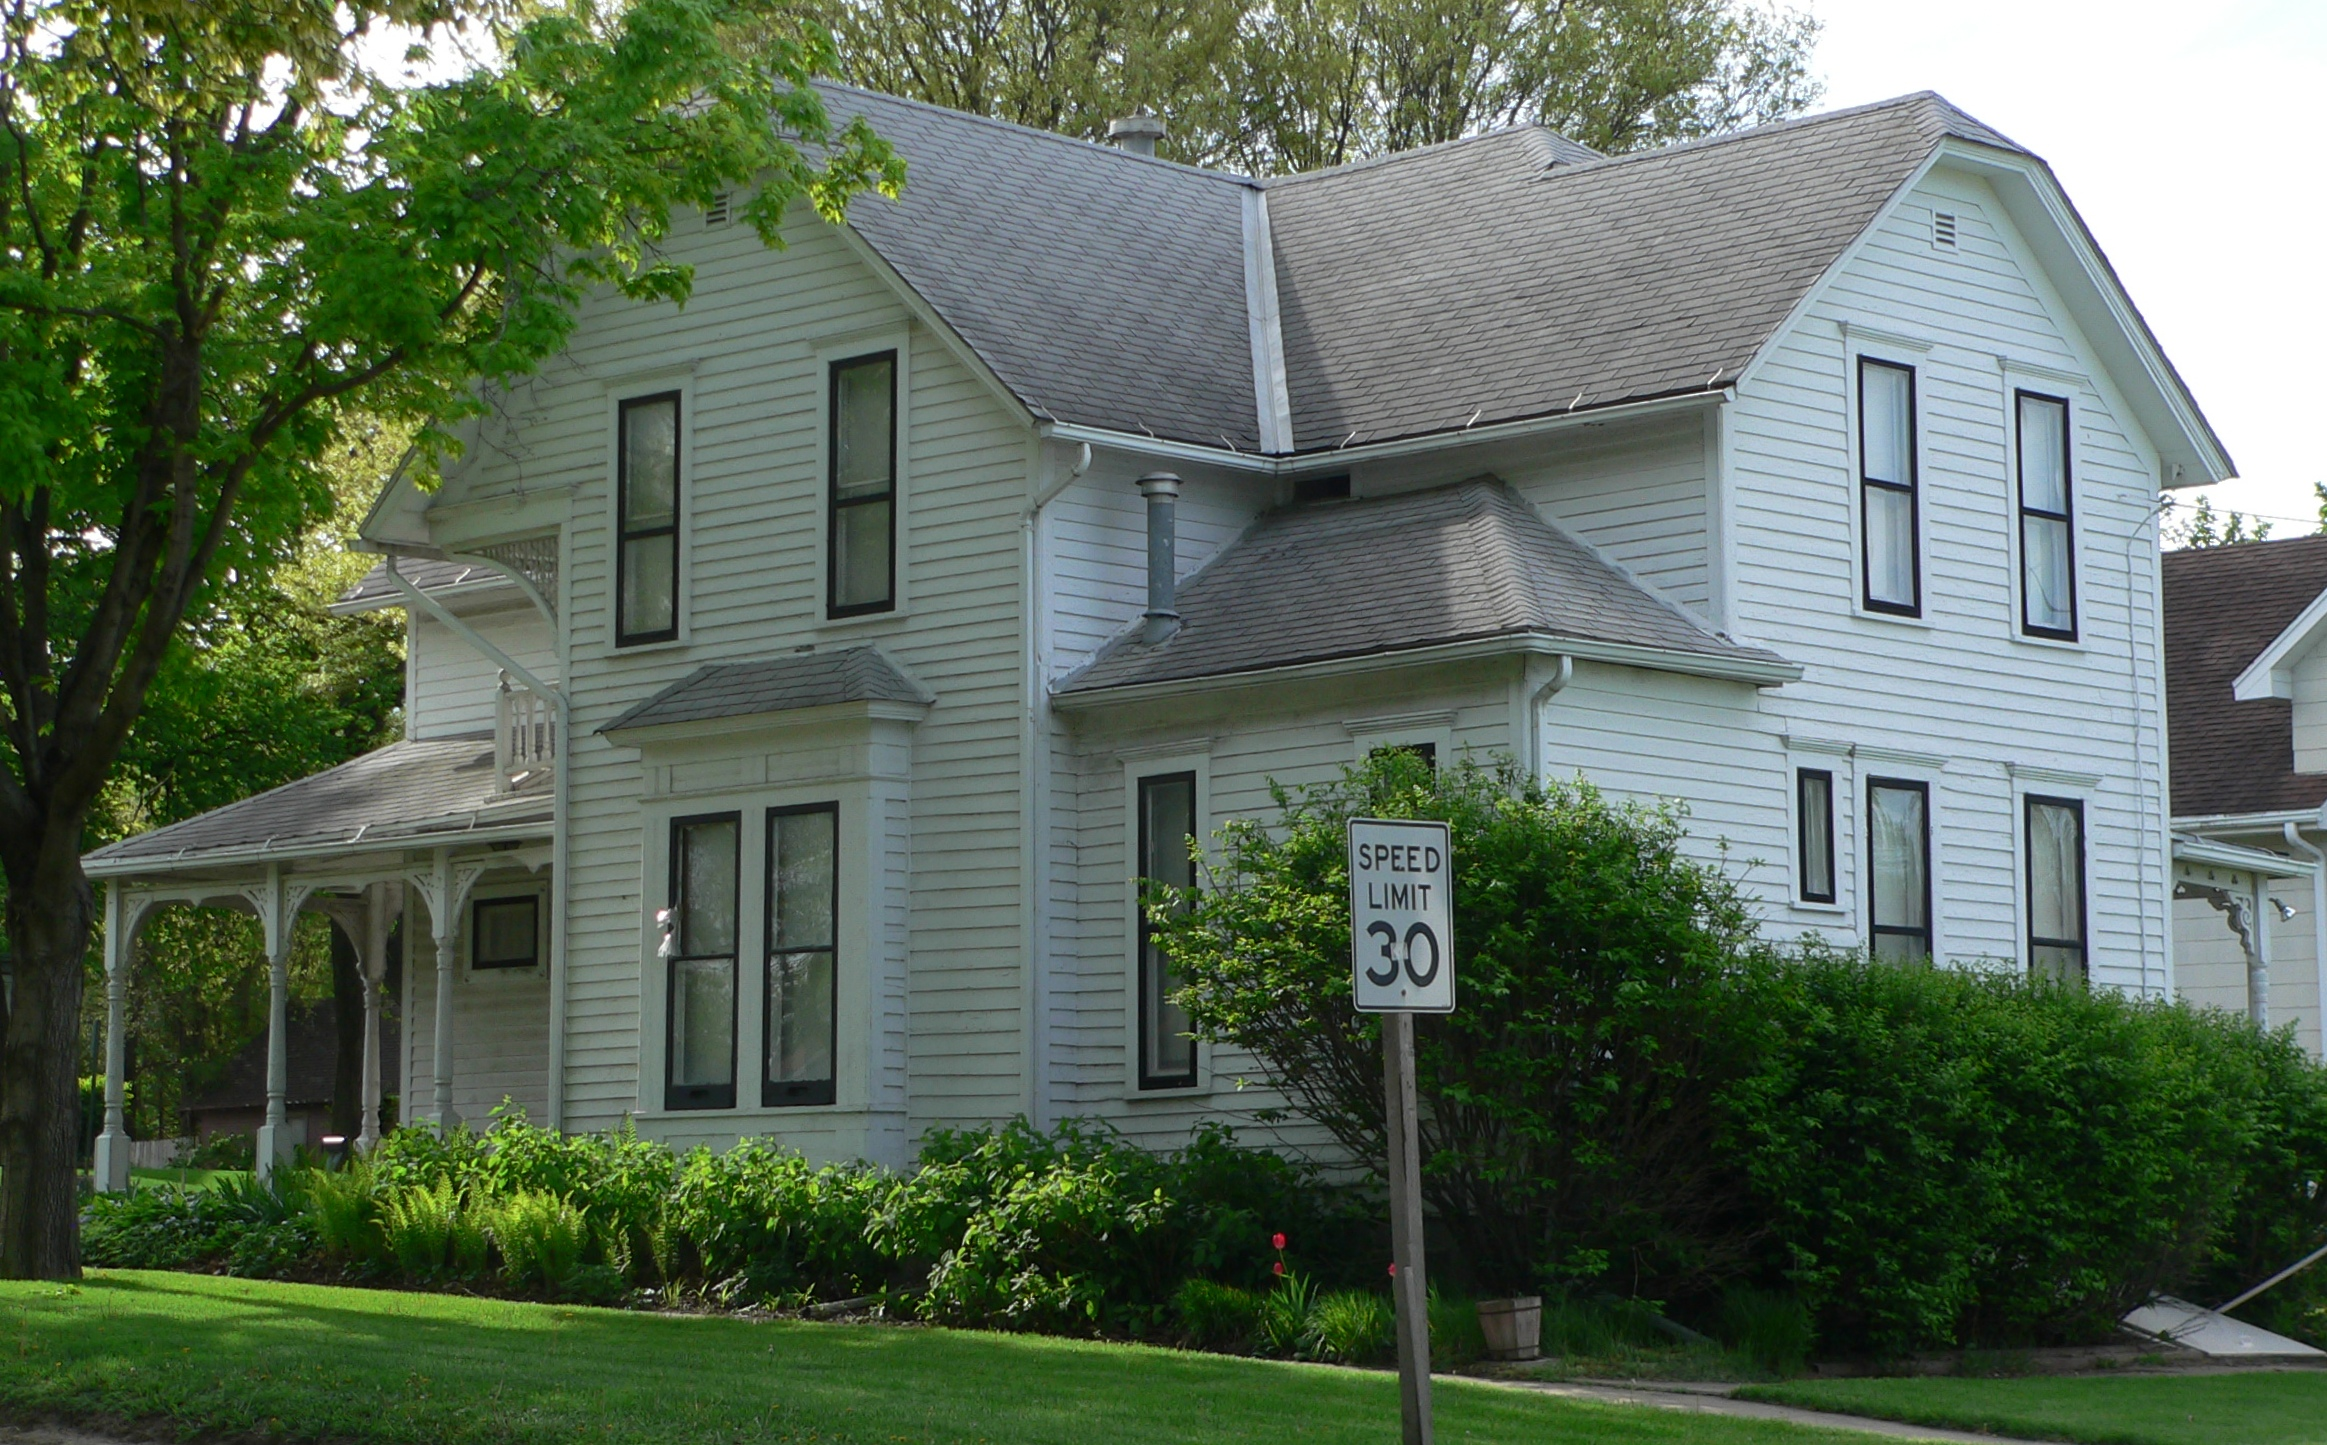 hansons house